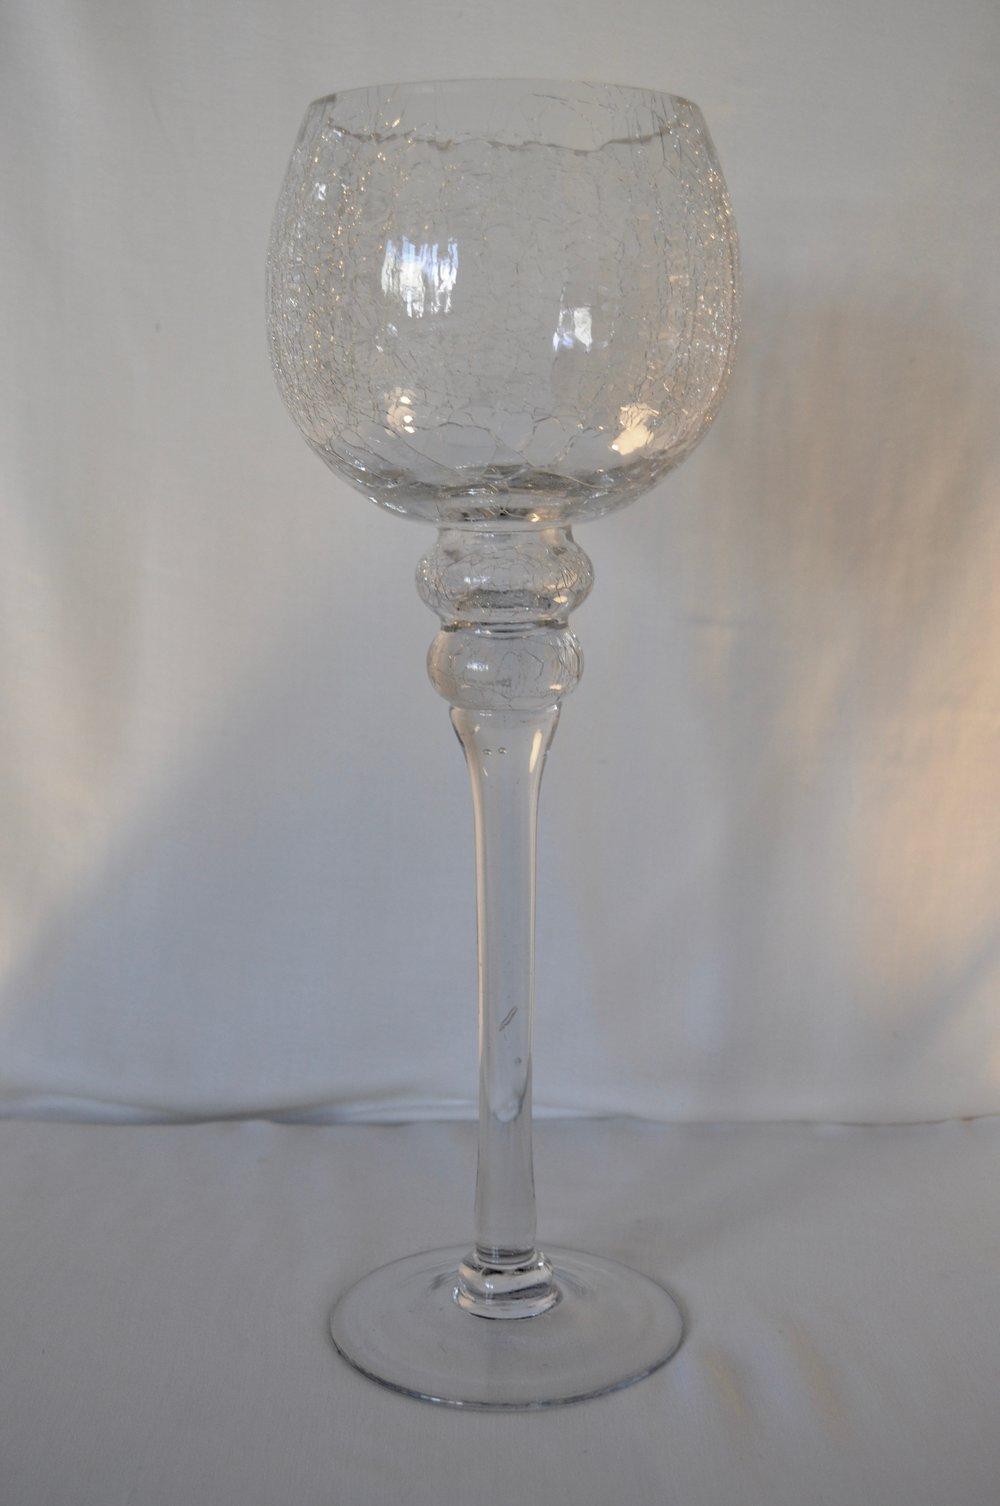 "Glass Candy Jar 6x16"" - Qty: 1"